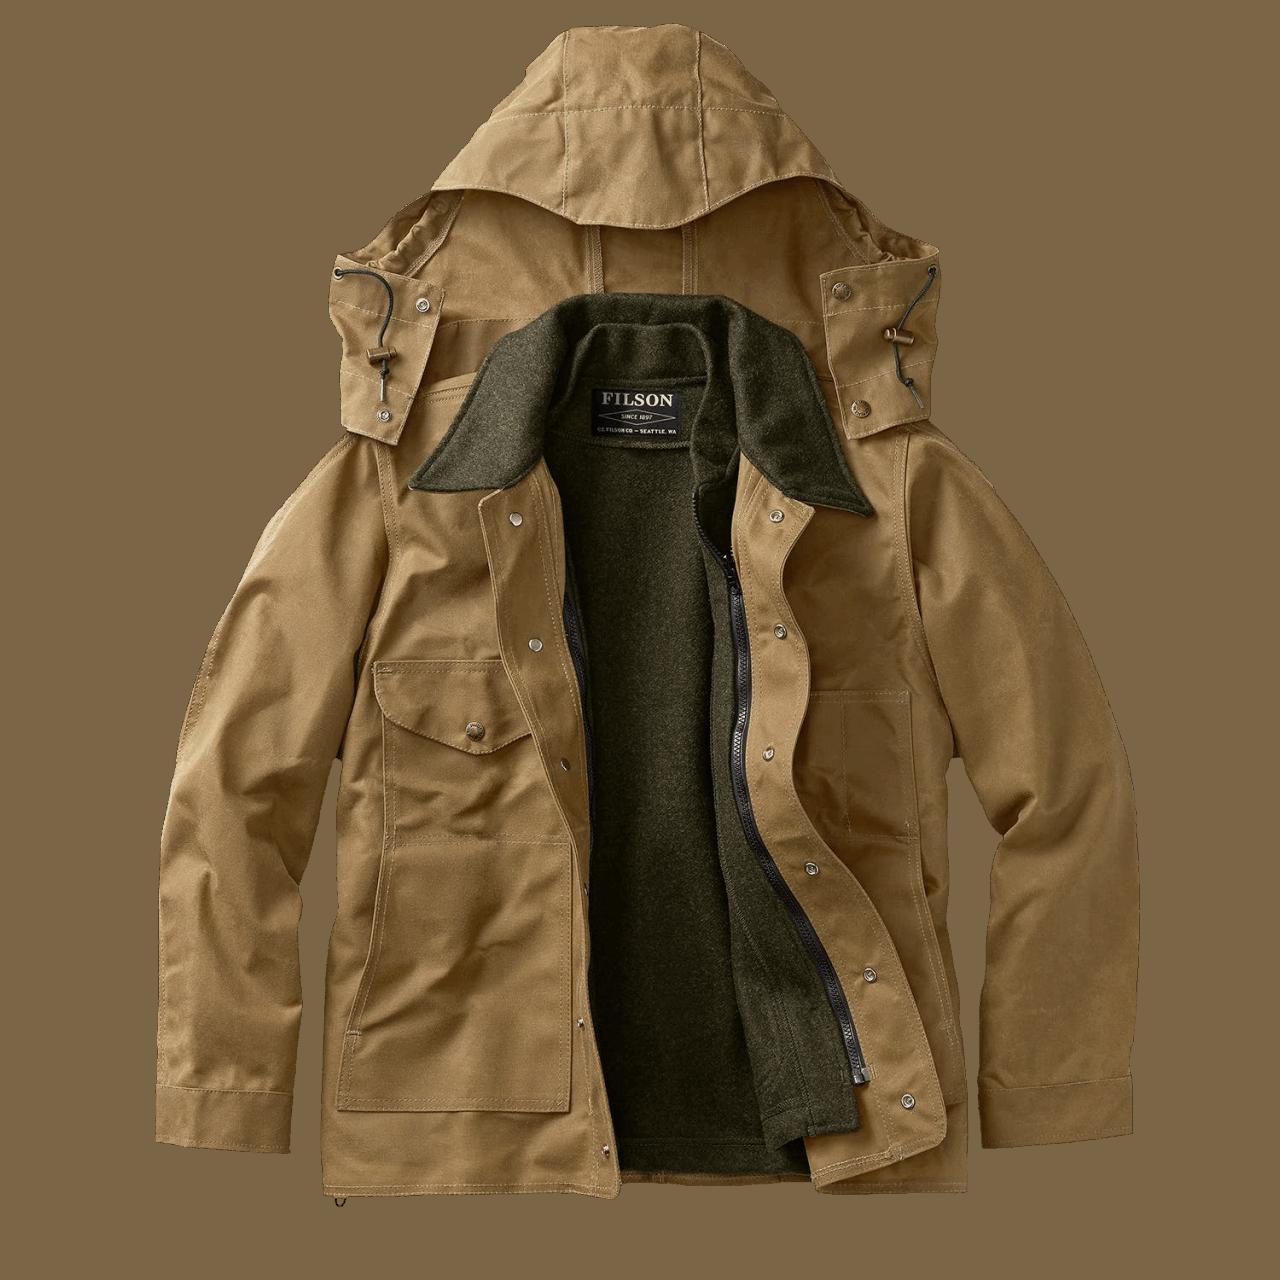 Filson Tin Cloth Jacket - Tan